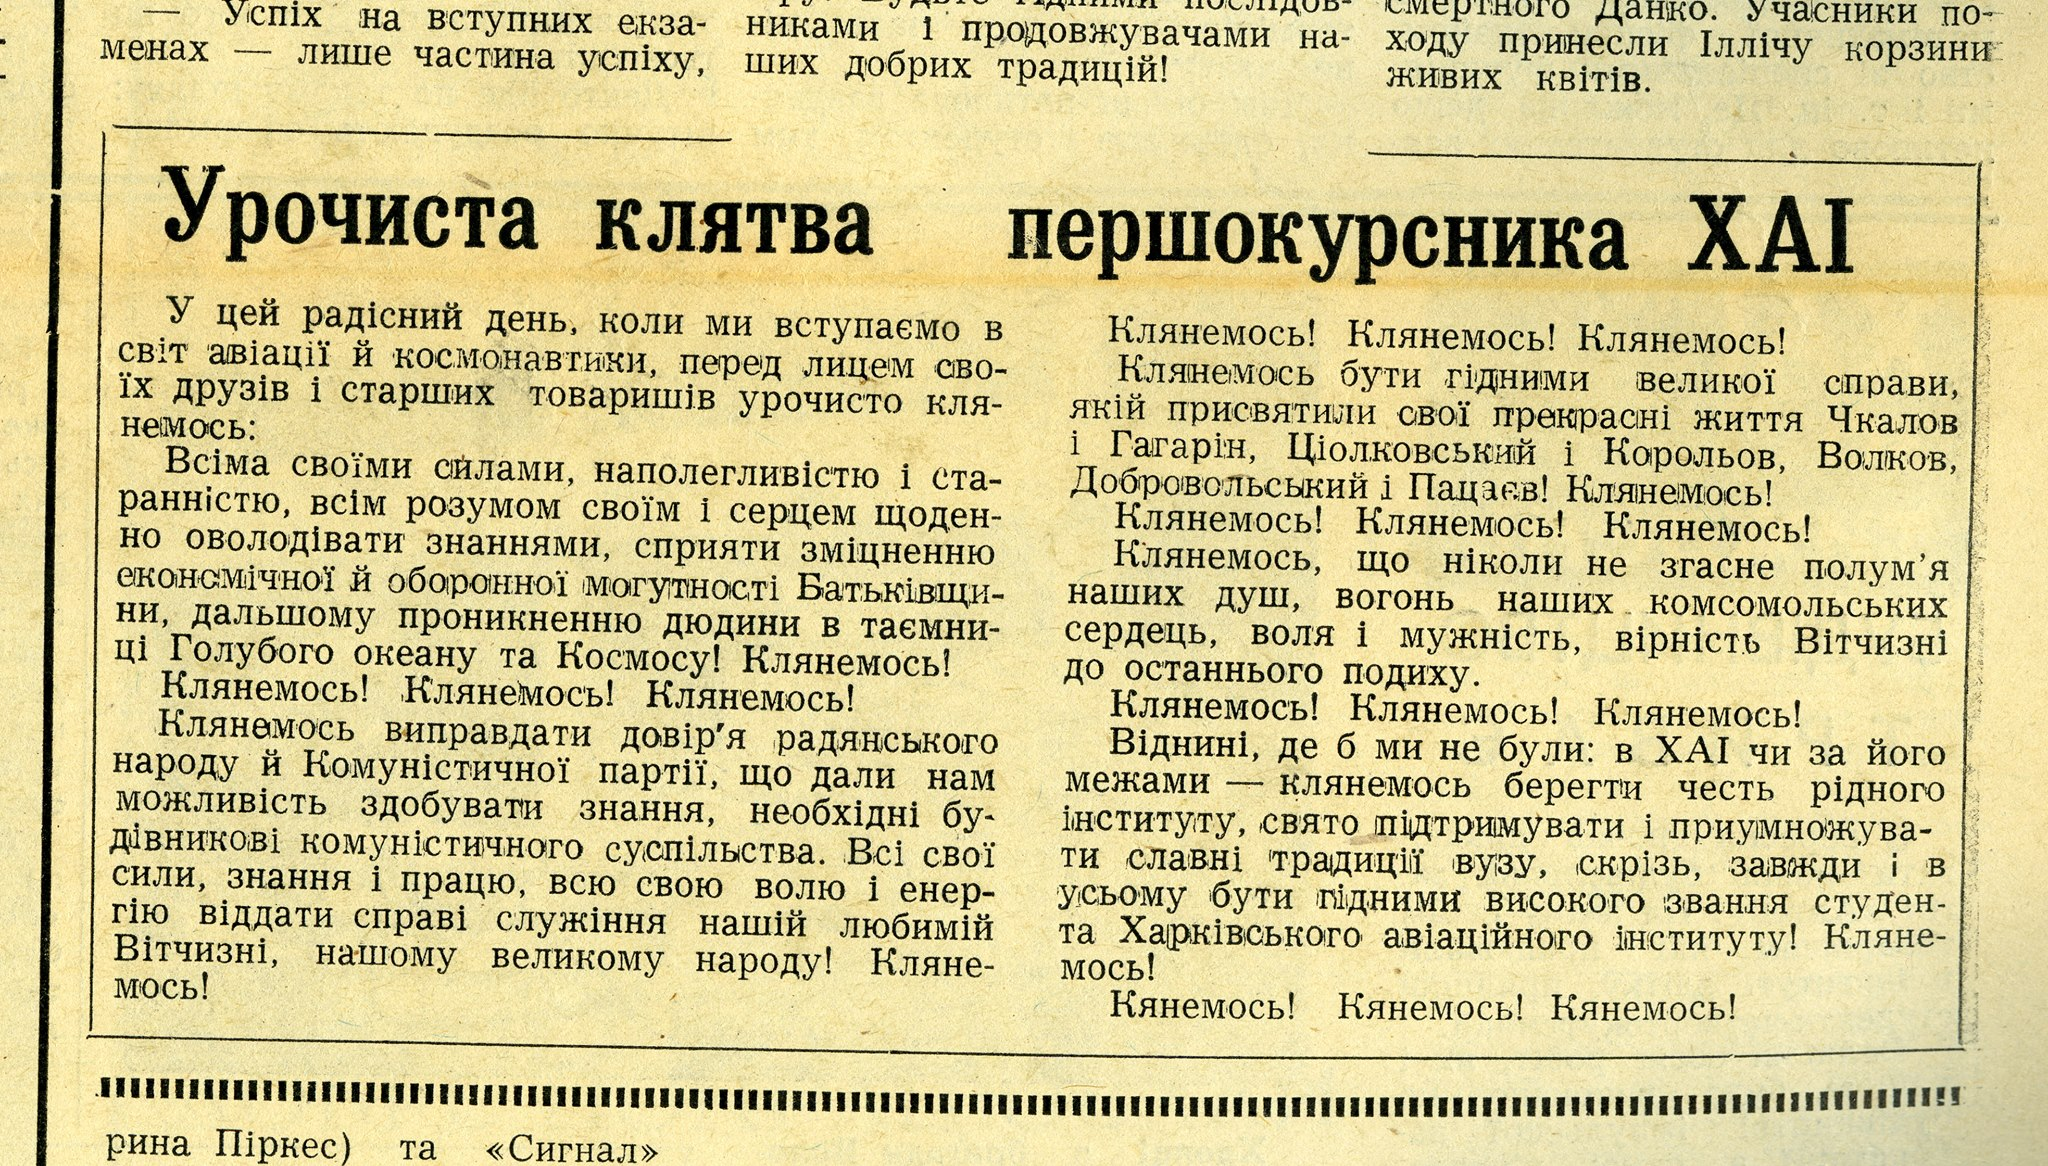 Клятва 1971 г. ХАИ